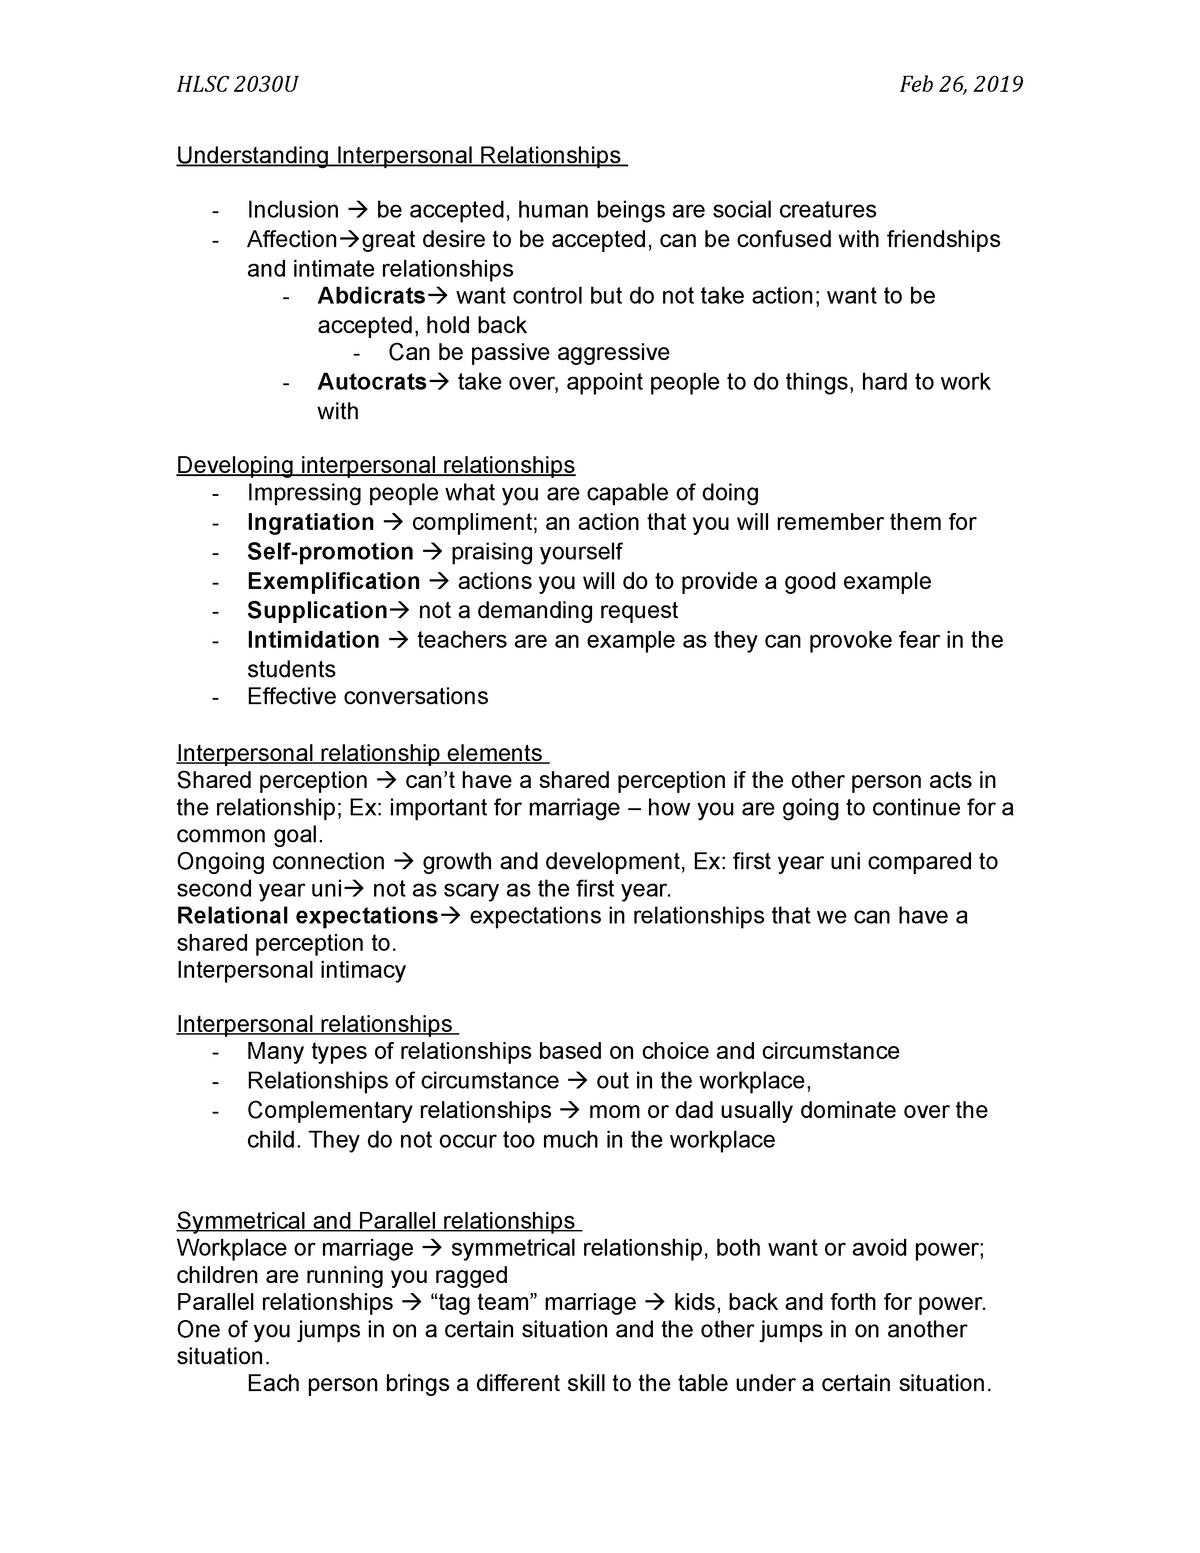 Understanding Interpersonal Relationships - HLSC 2030 - UOIT